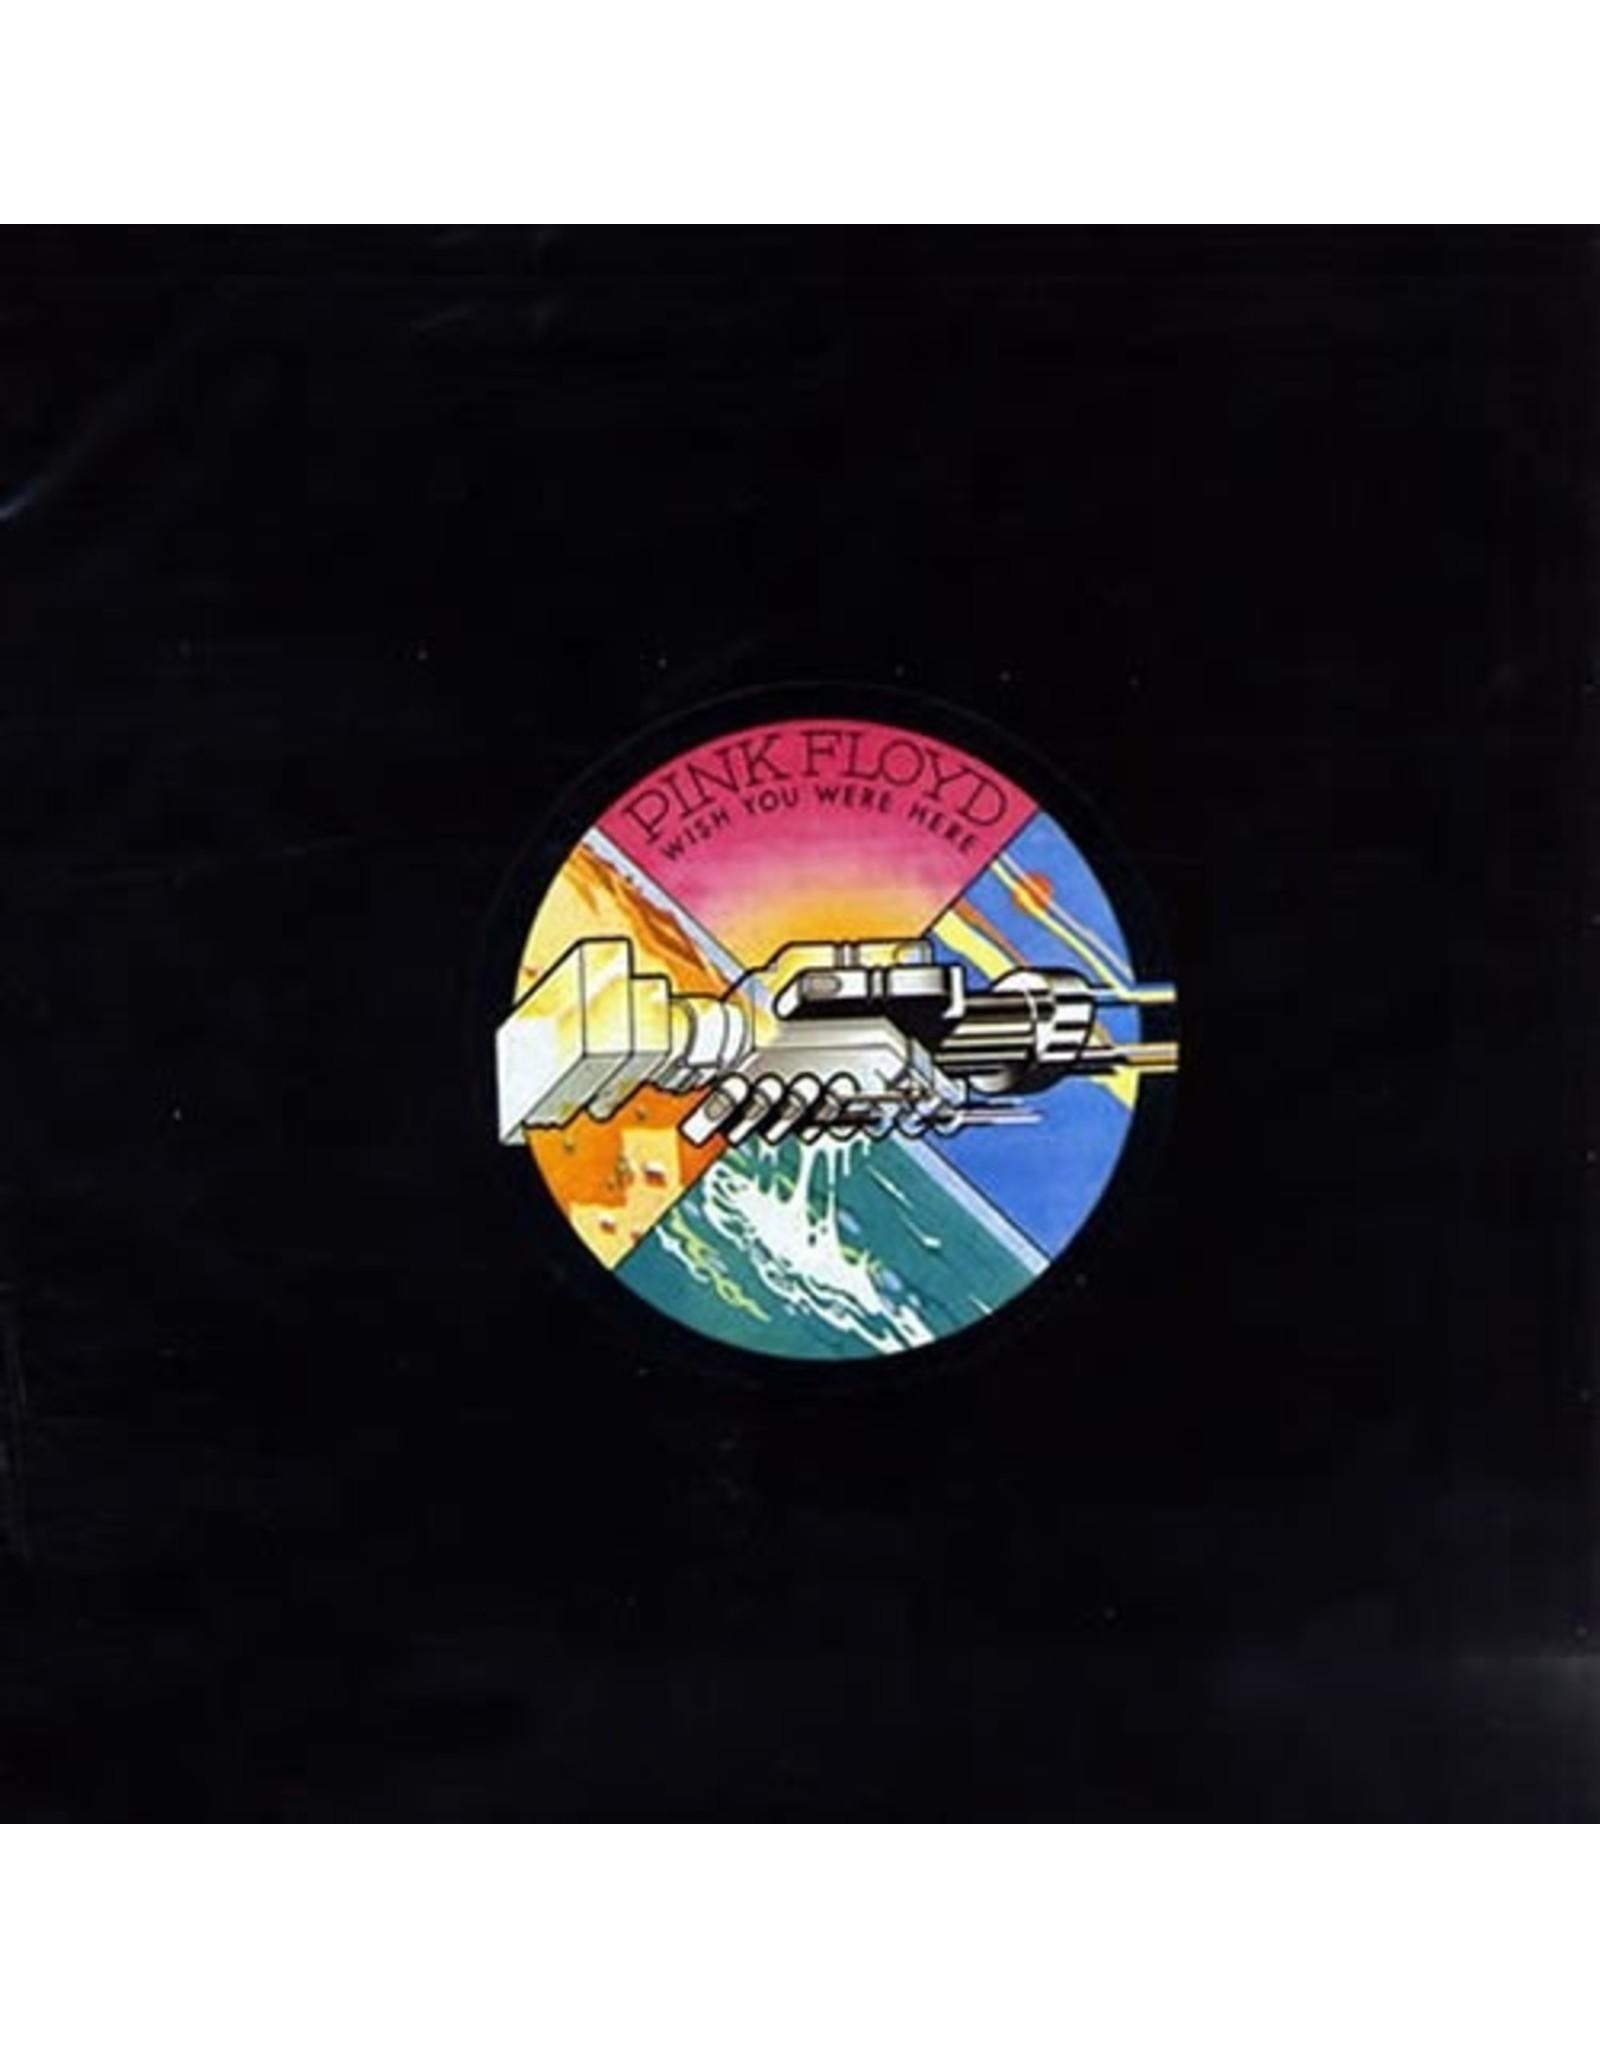 New Vinyl Pink Floyd - Wish You Were Here LP